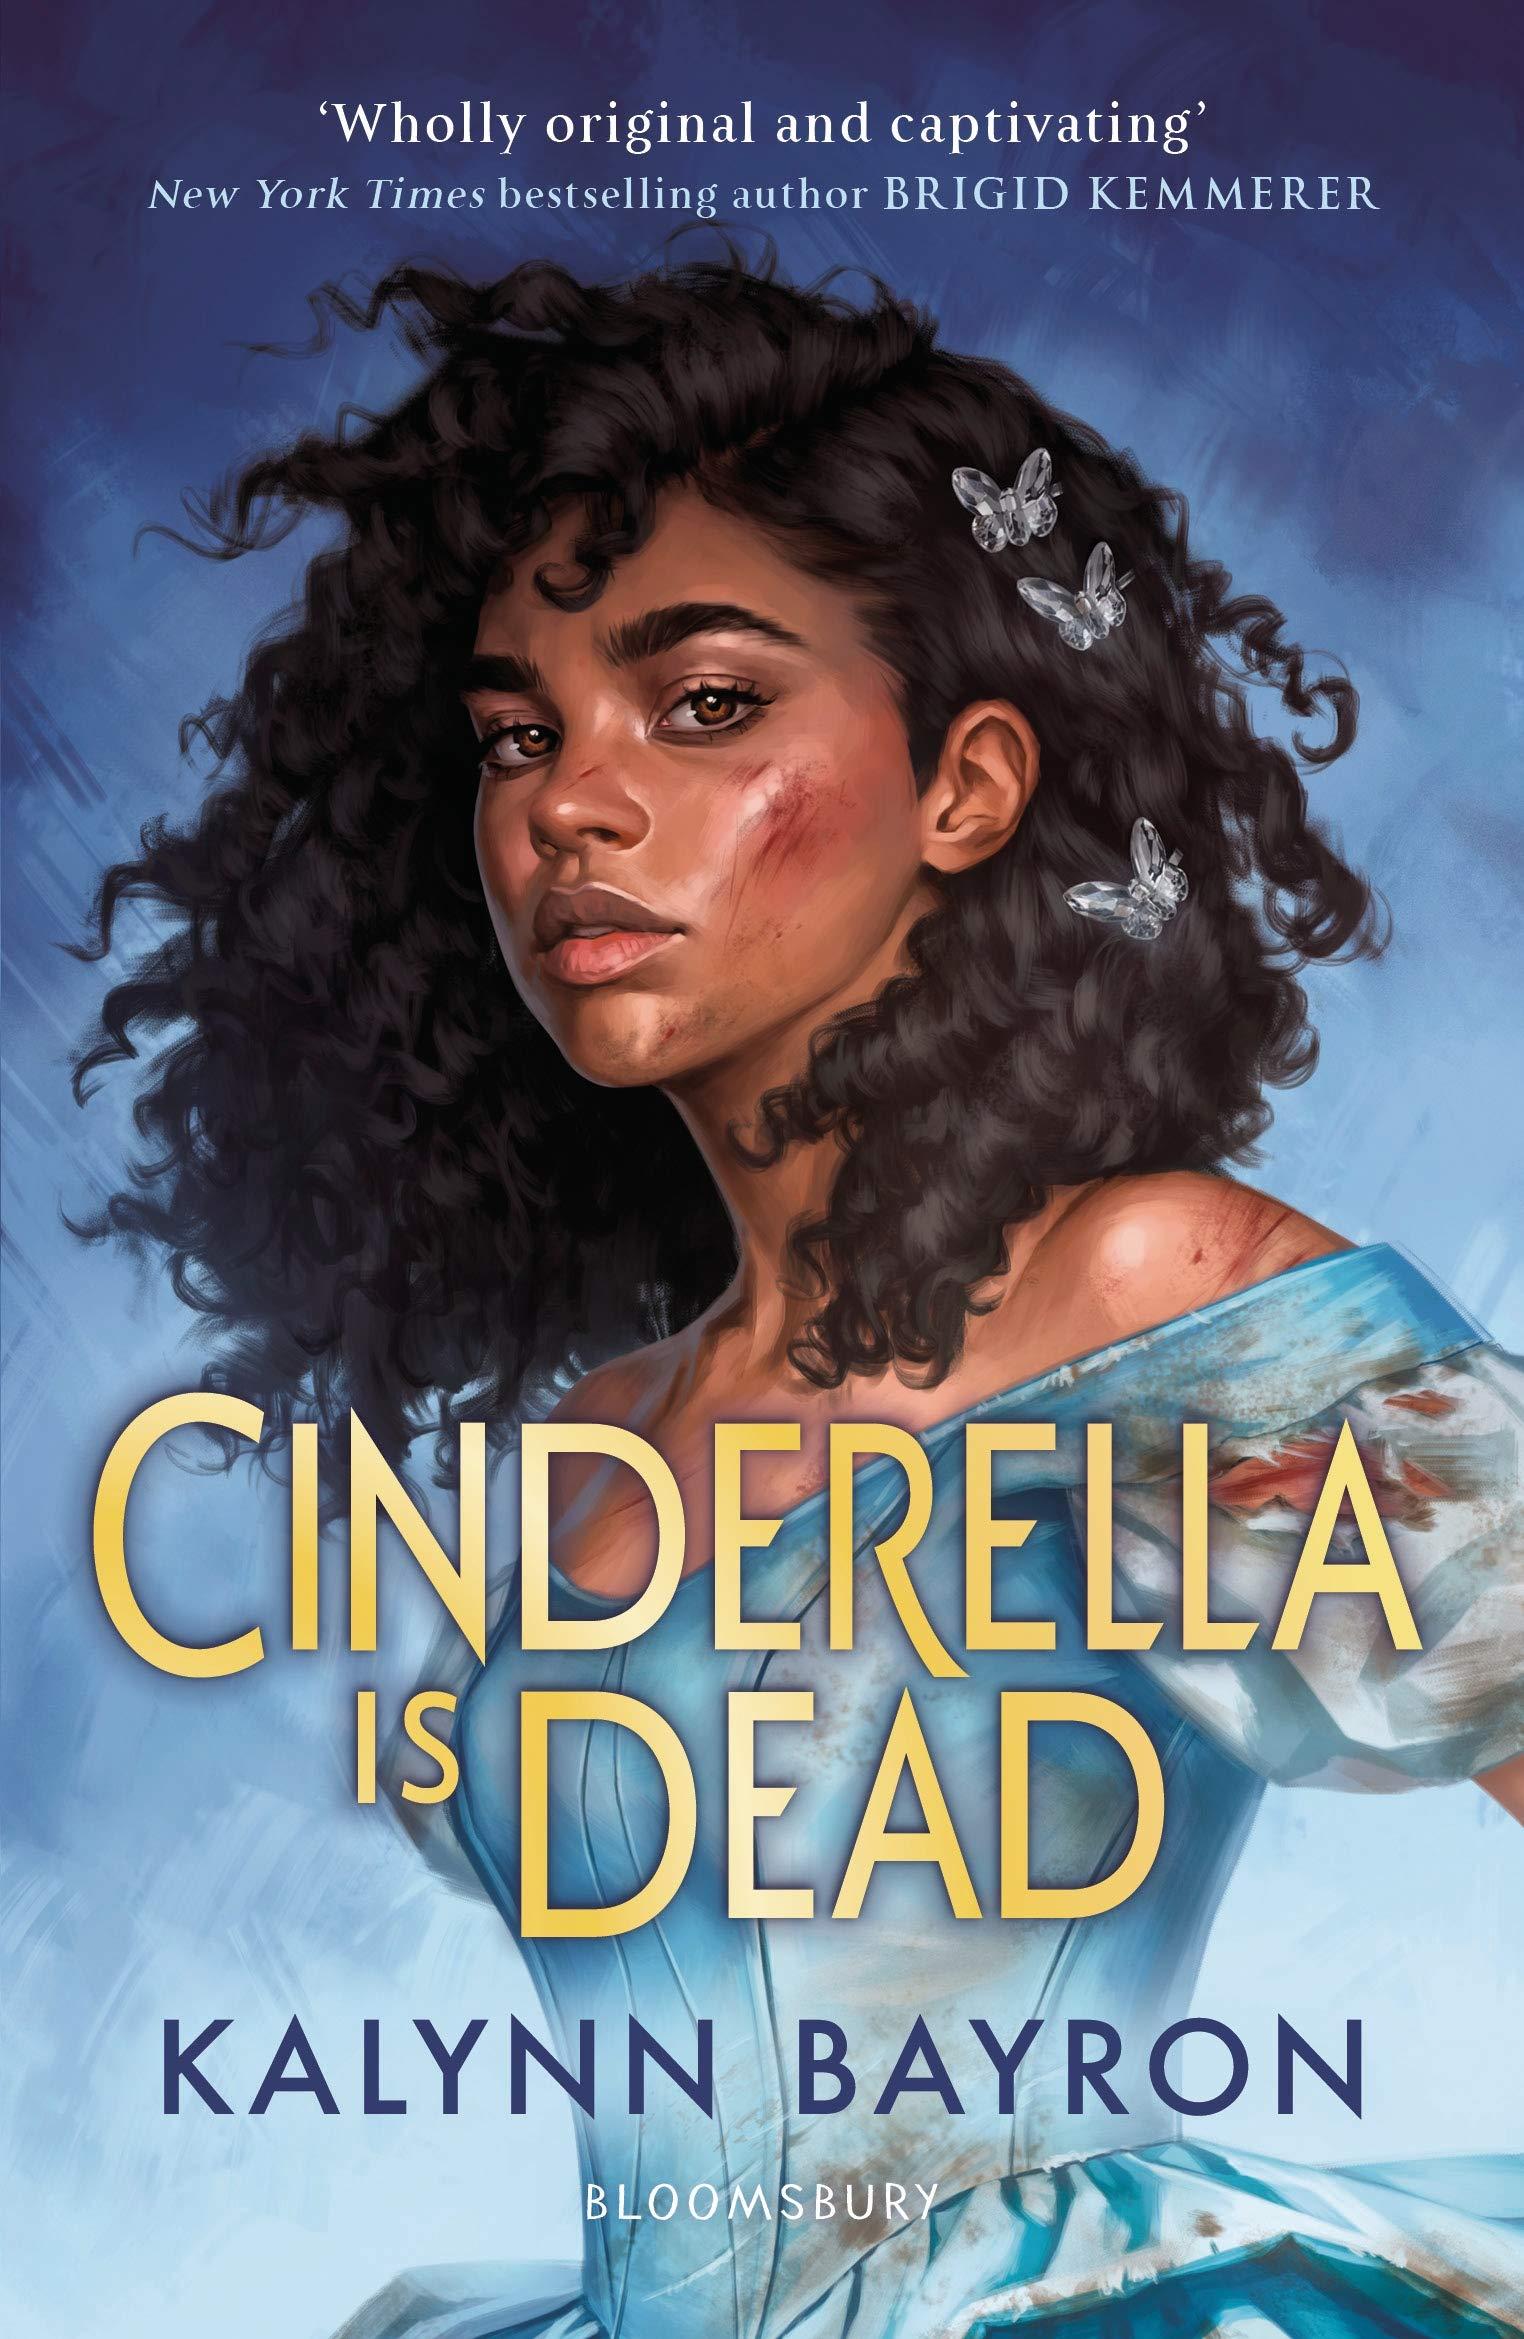 Cinderella Is Dead: Kalynn Bayron: 9781526621979: Amazon.com: Books